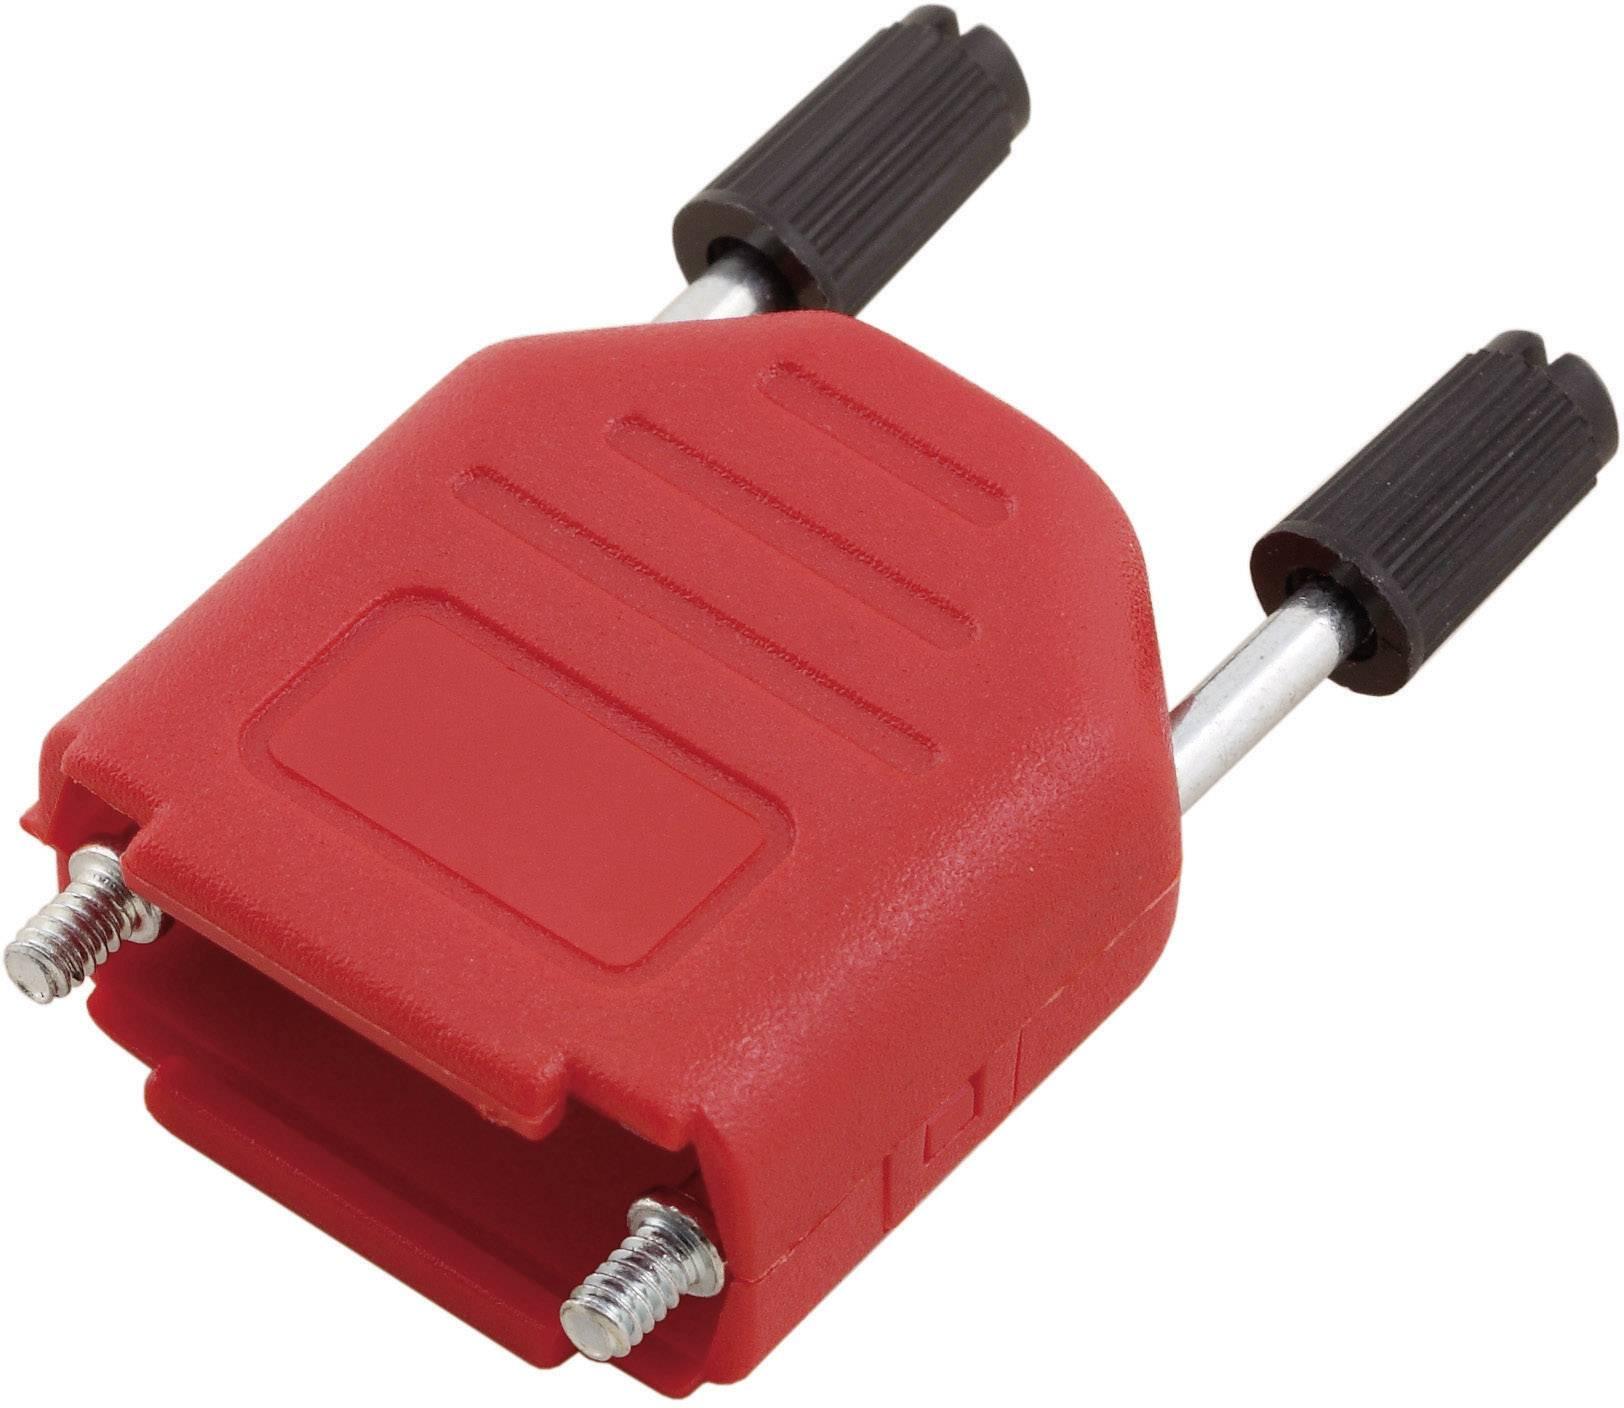 D-SUB pouzdro MH Connectors MHDPPK09-R-K, Pólů: 9, plast, 180 °, červená, 1 ks